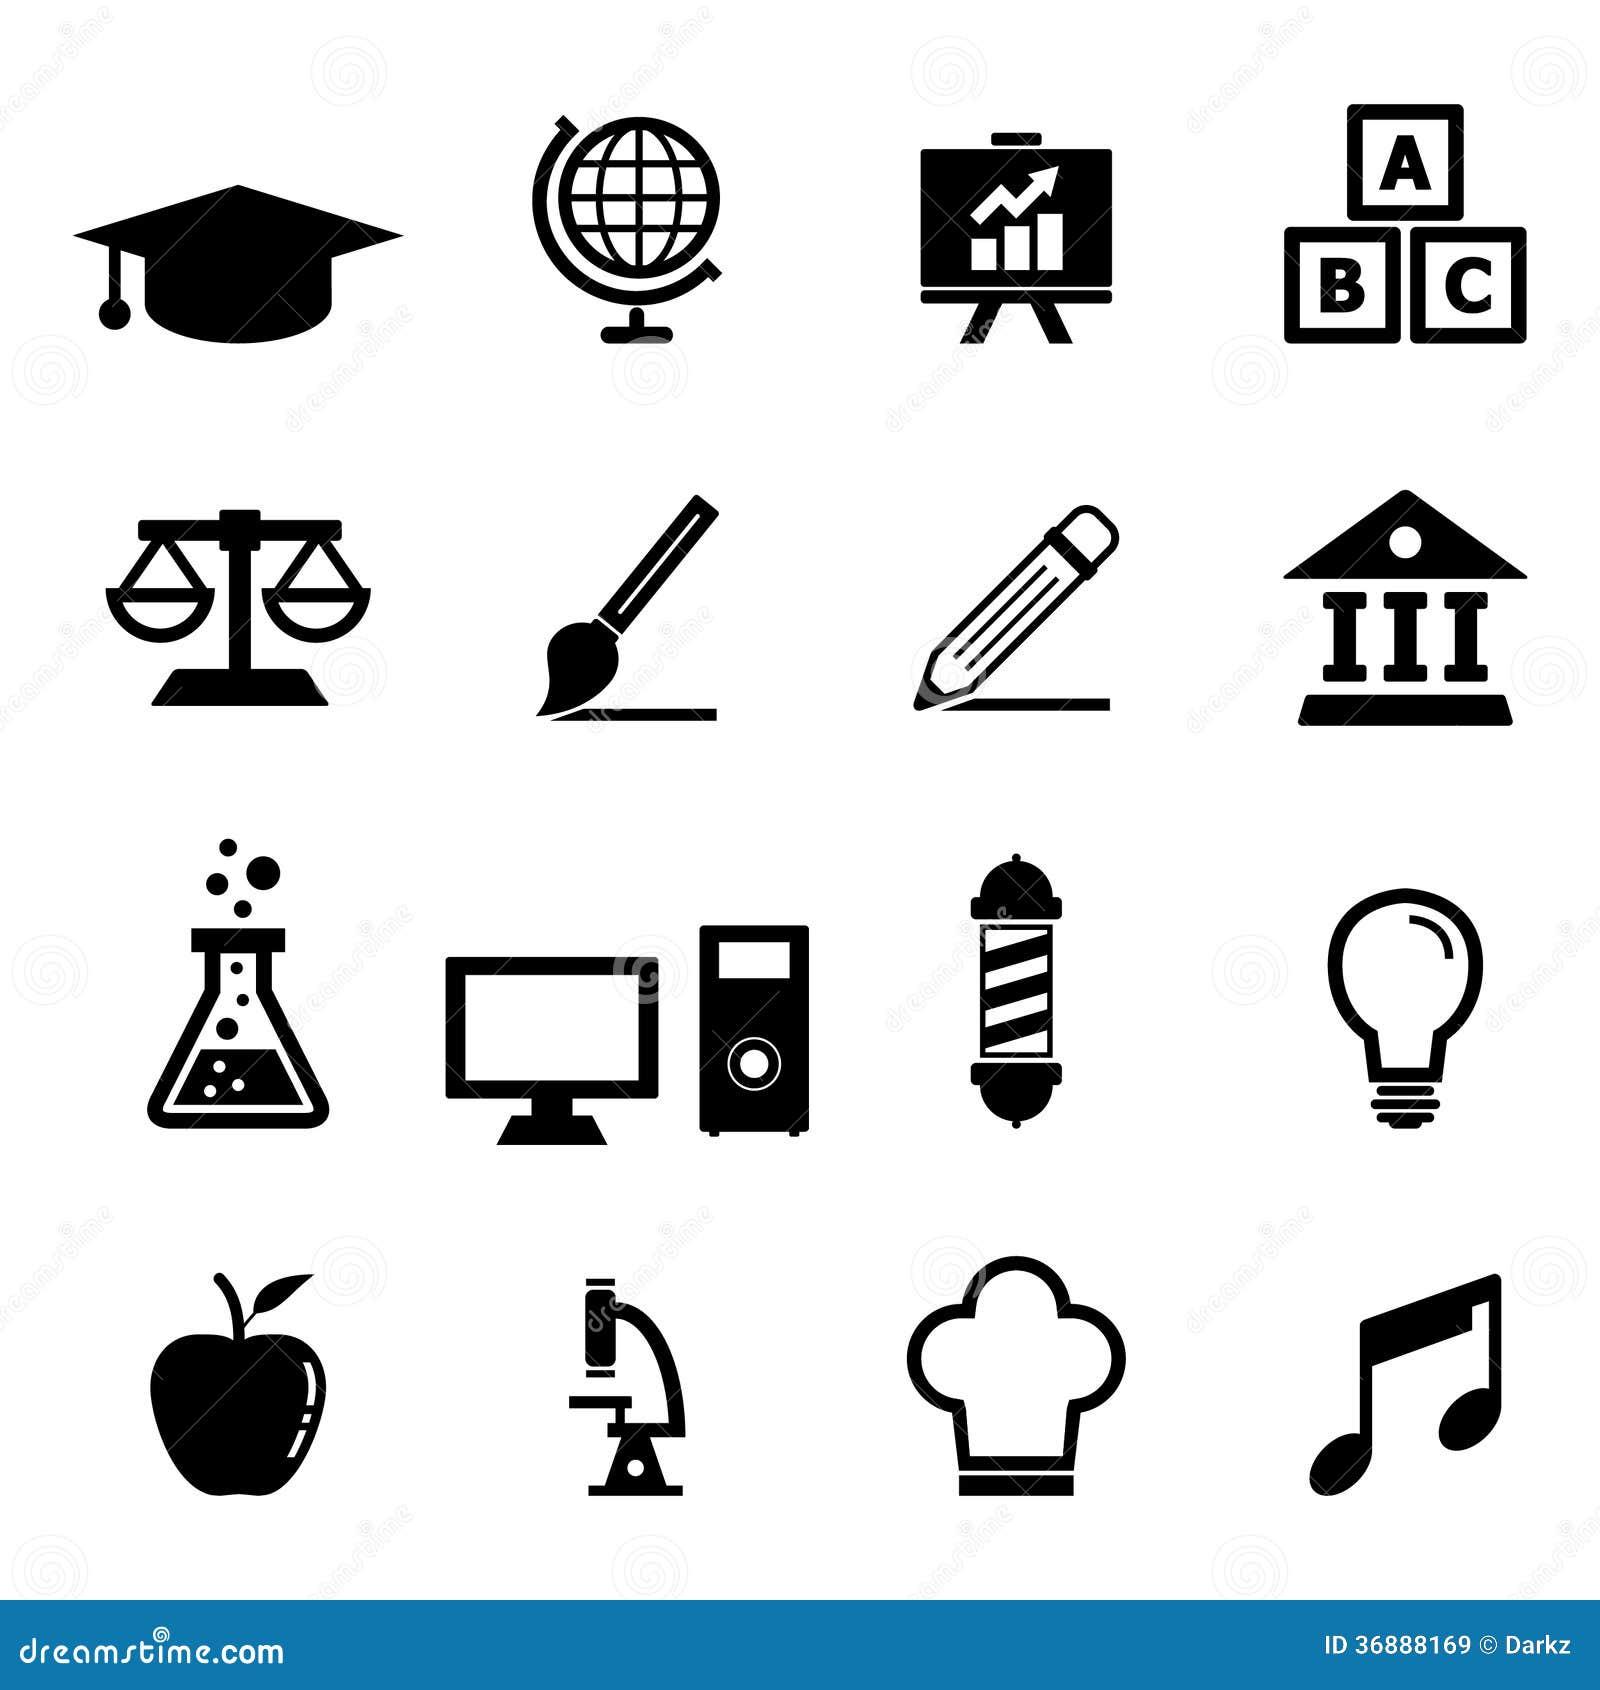 Education Icon Royalty Free Stock Image